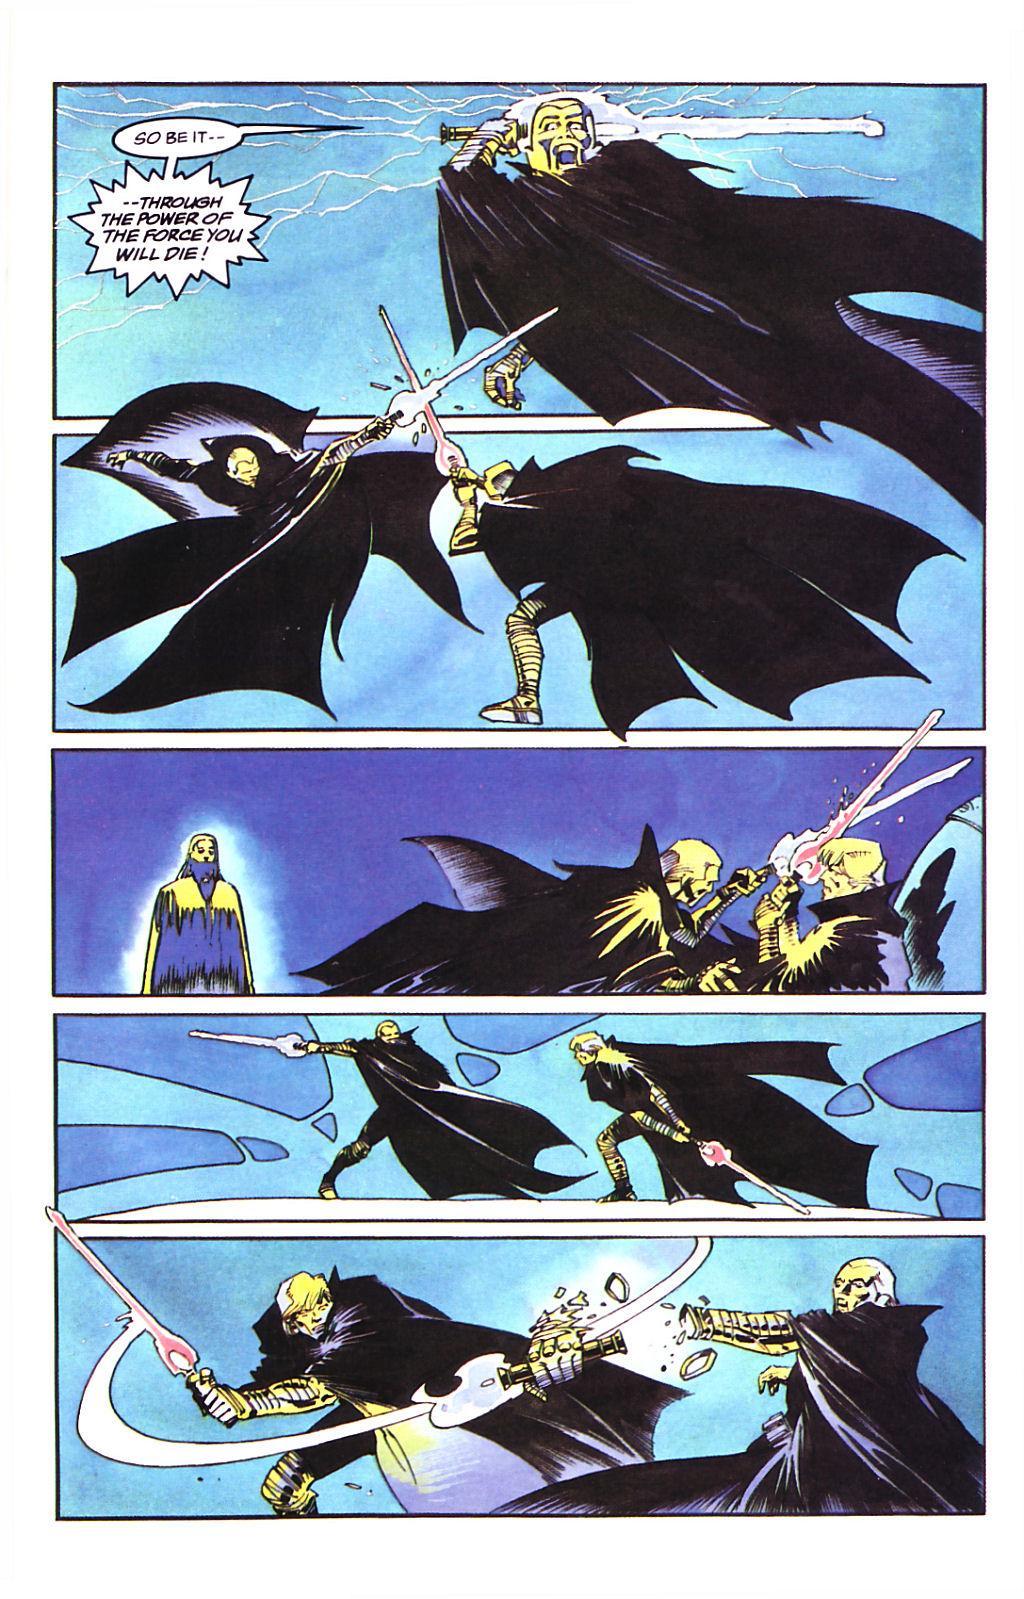 SS - Darth Caedus (The Ellimist) vs The Alliance Commander (xSupremeSkillz) Eode3